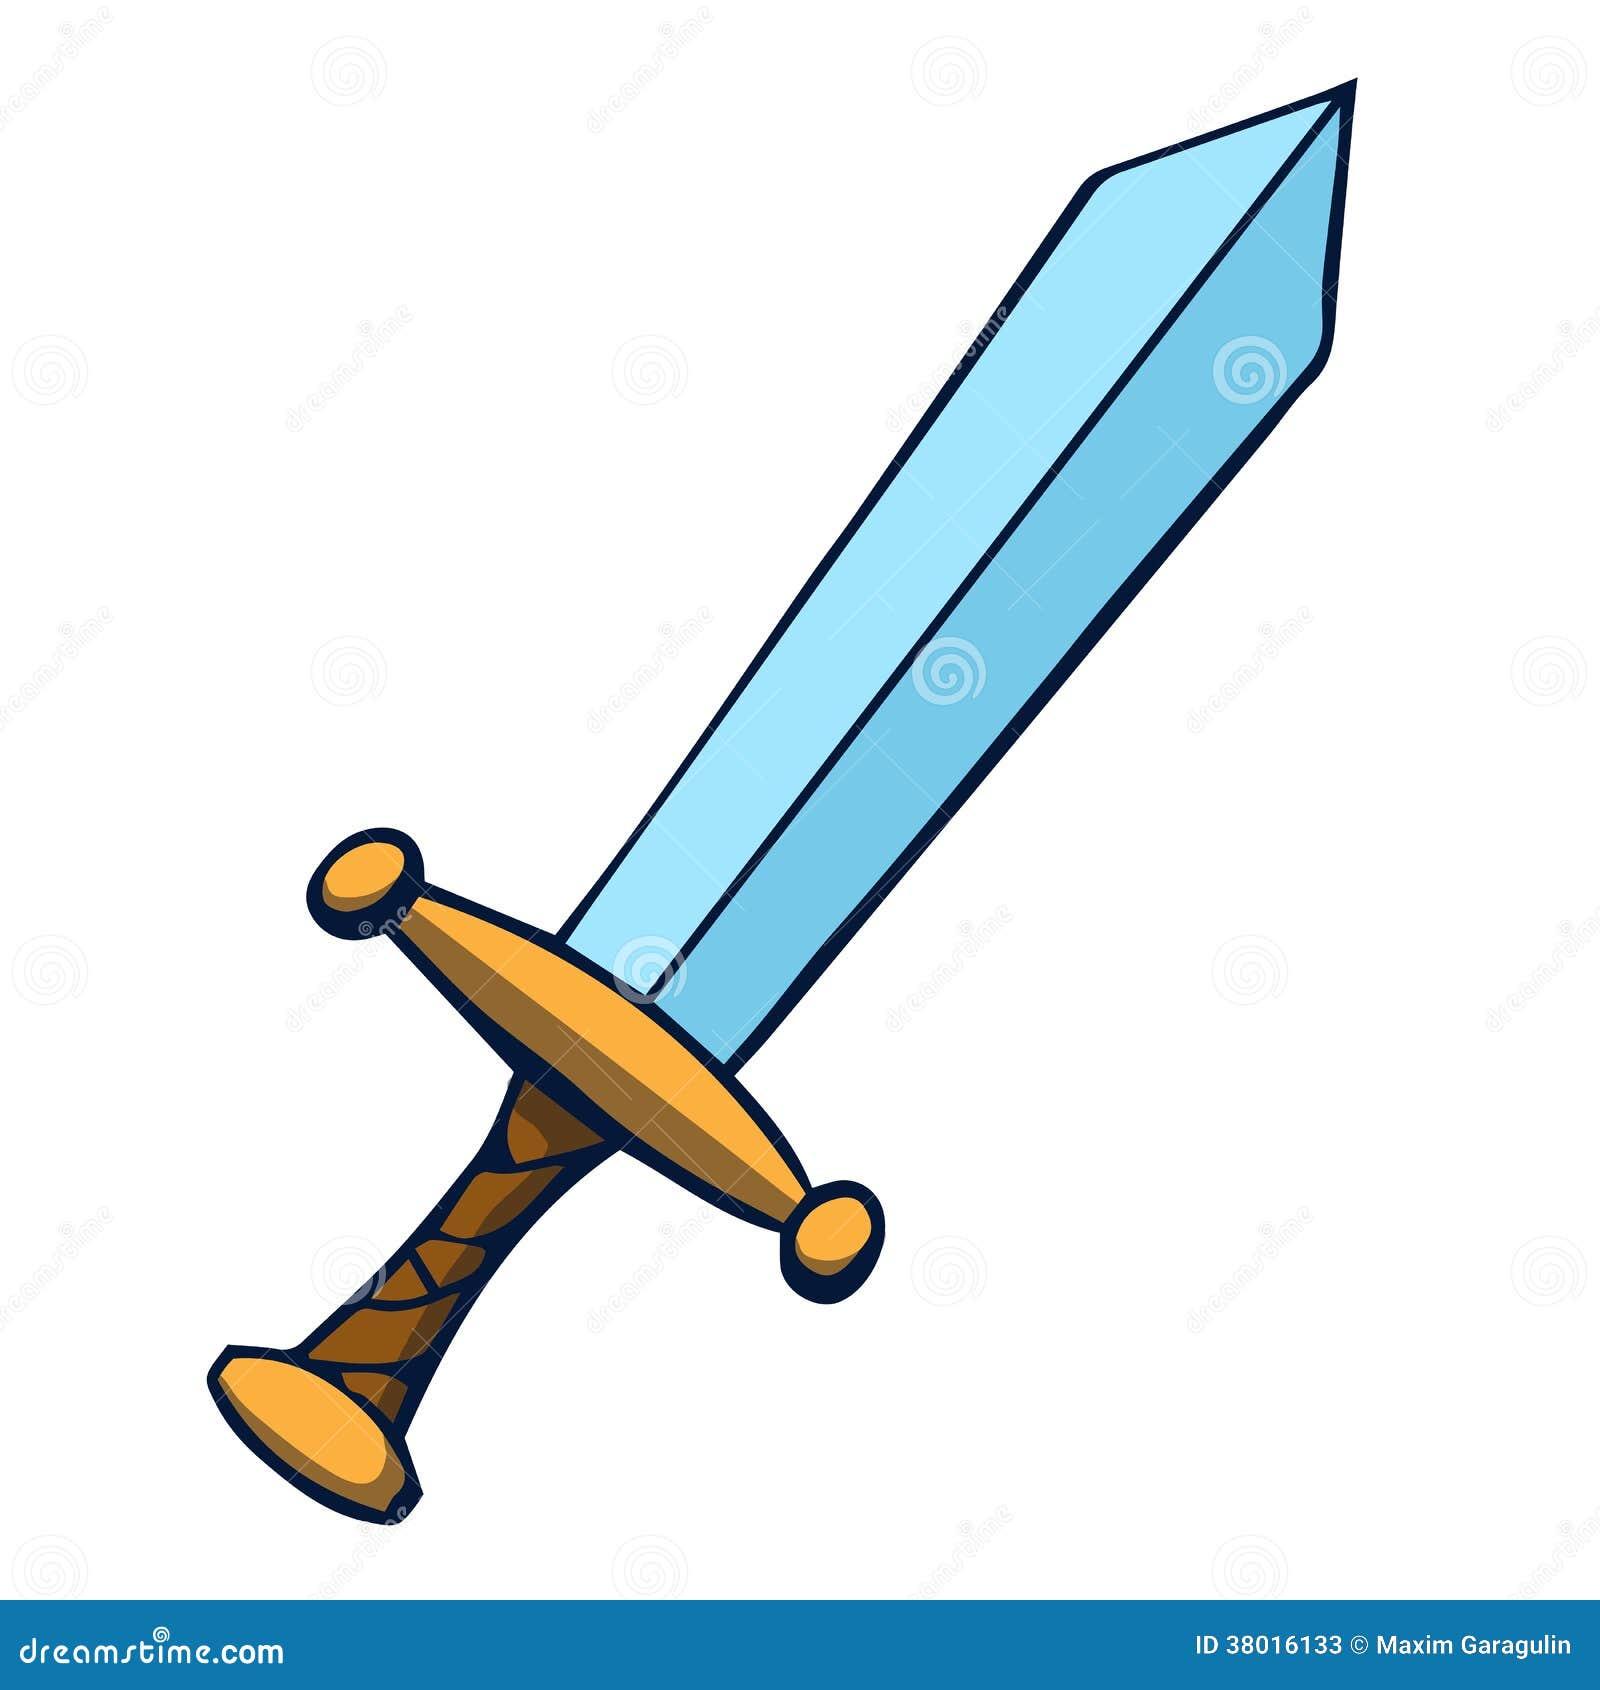 minecraft sword clipart - photo #17